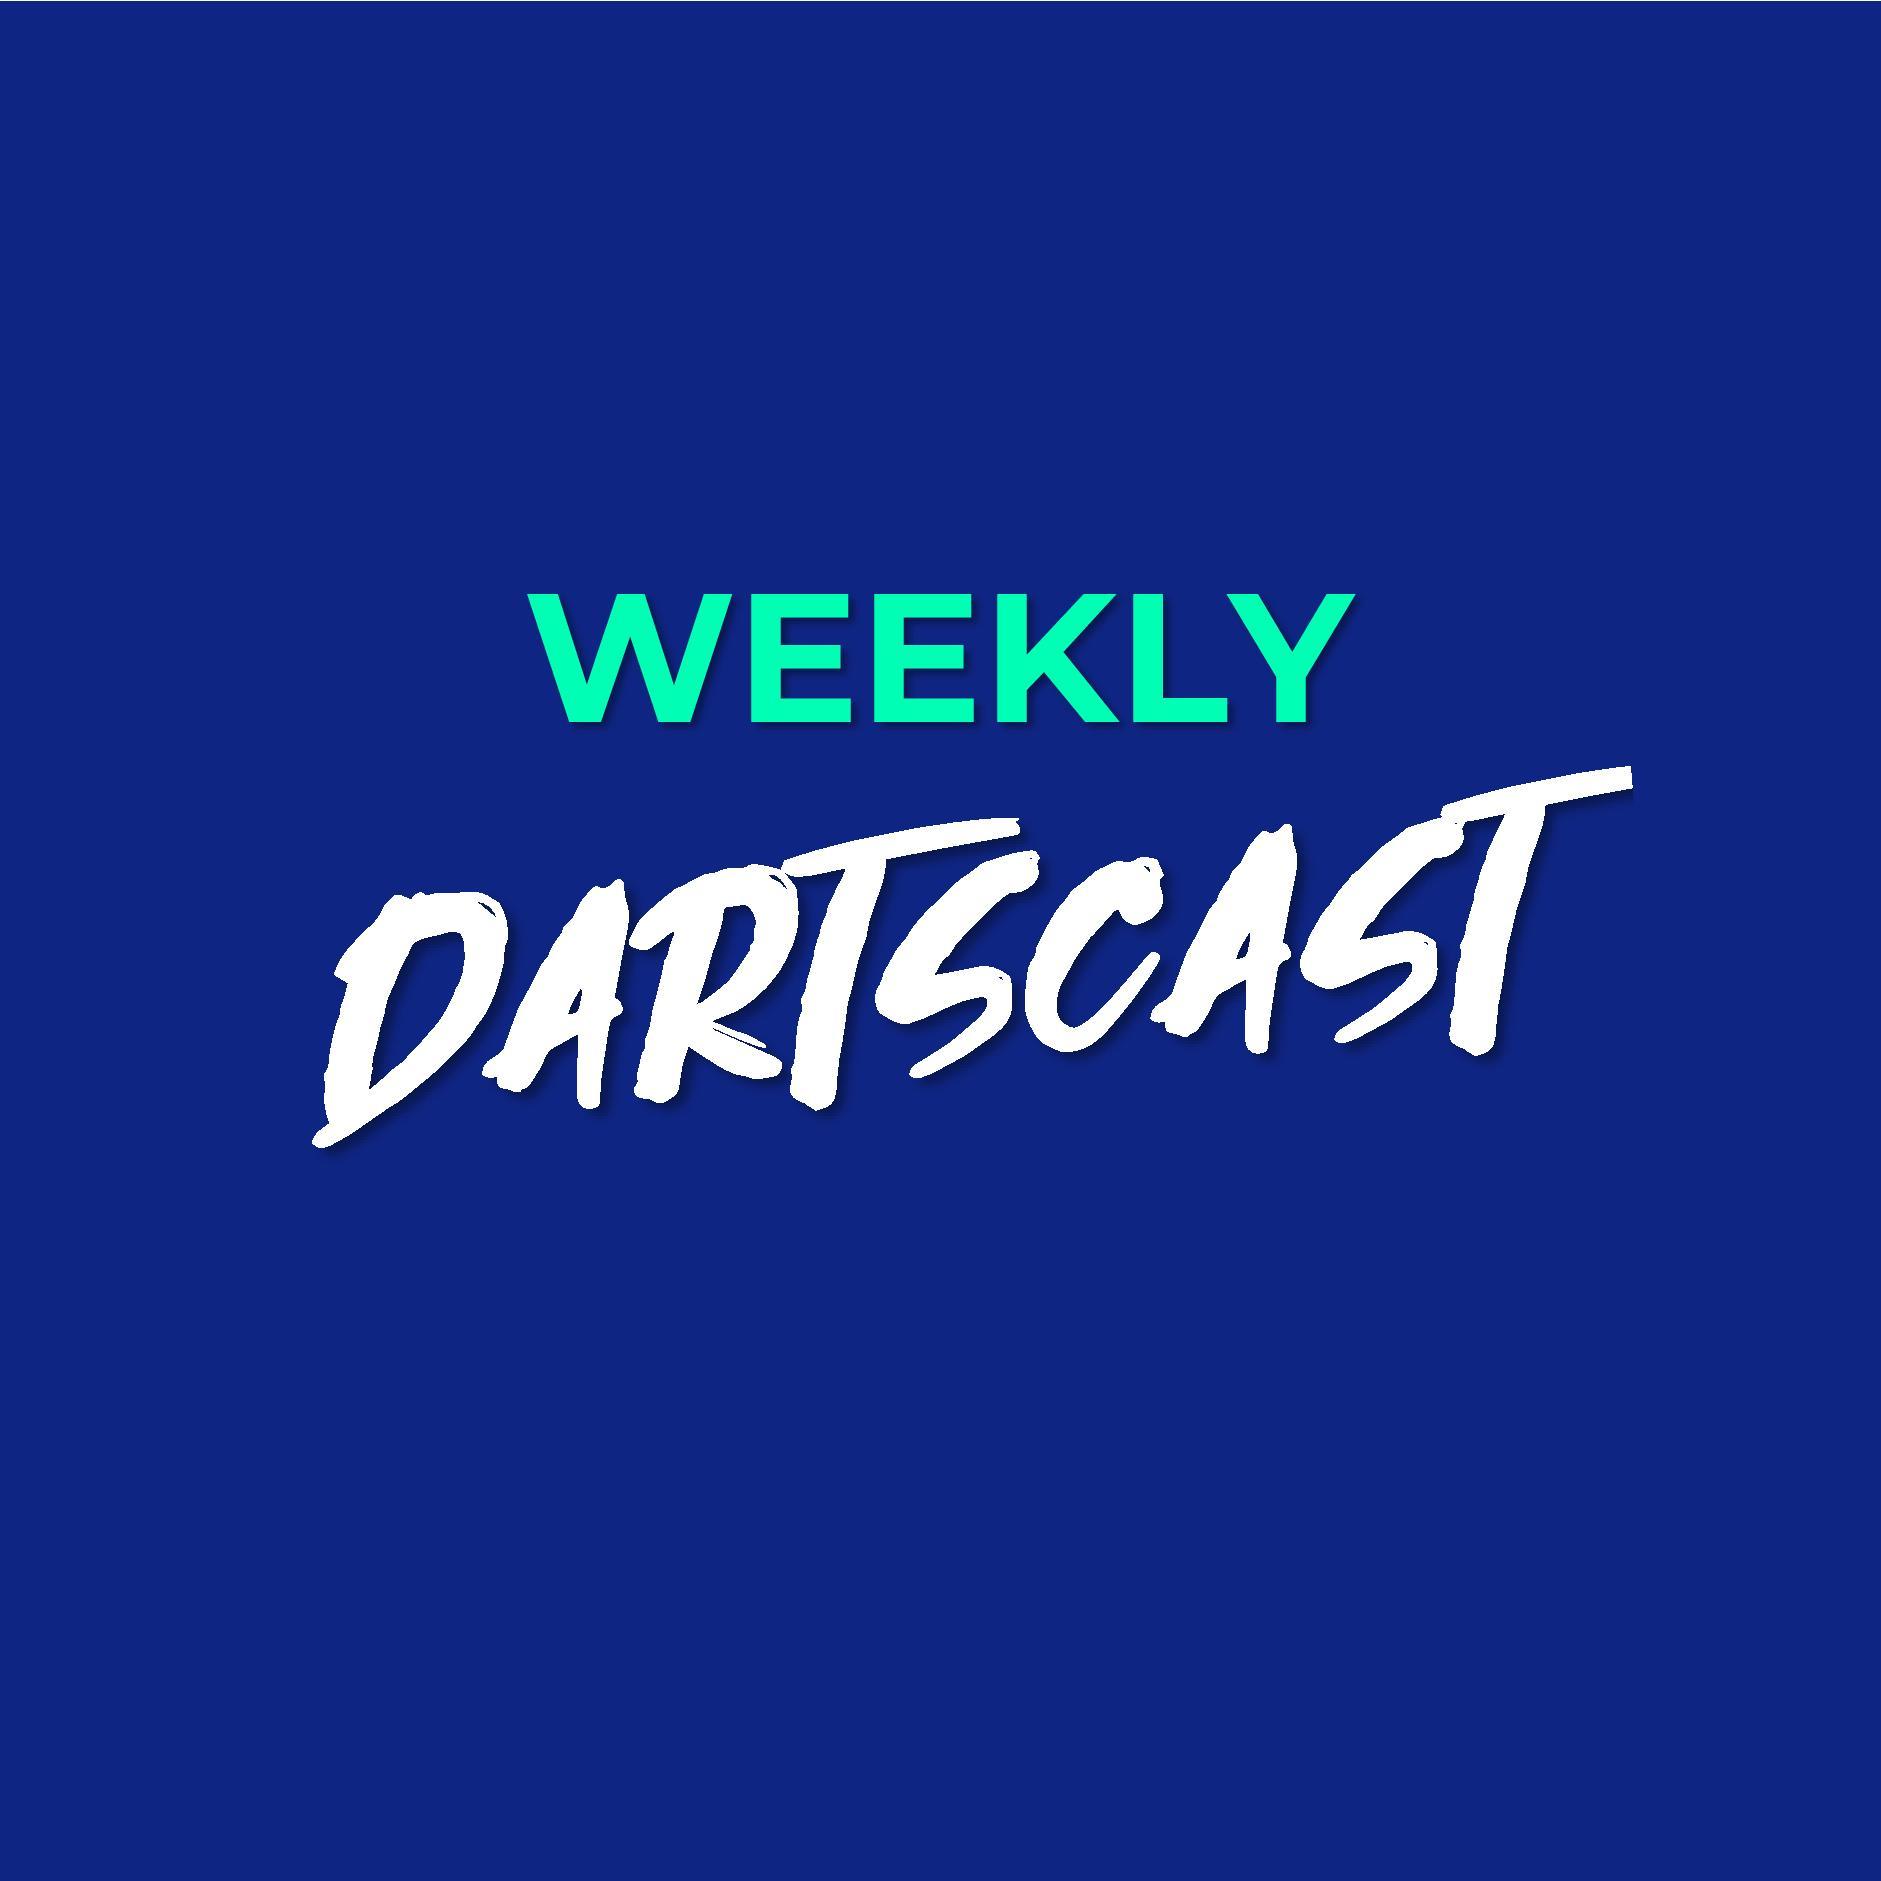 The Weekly Dartscast show art